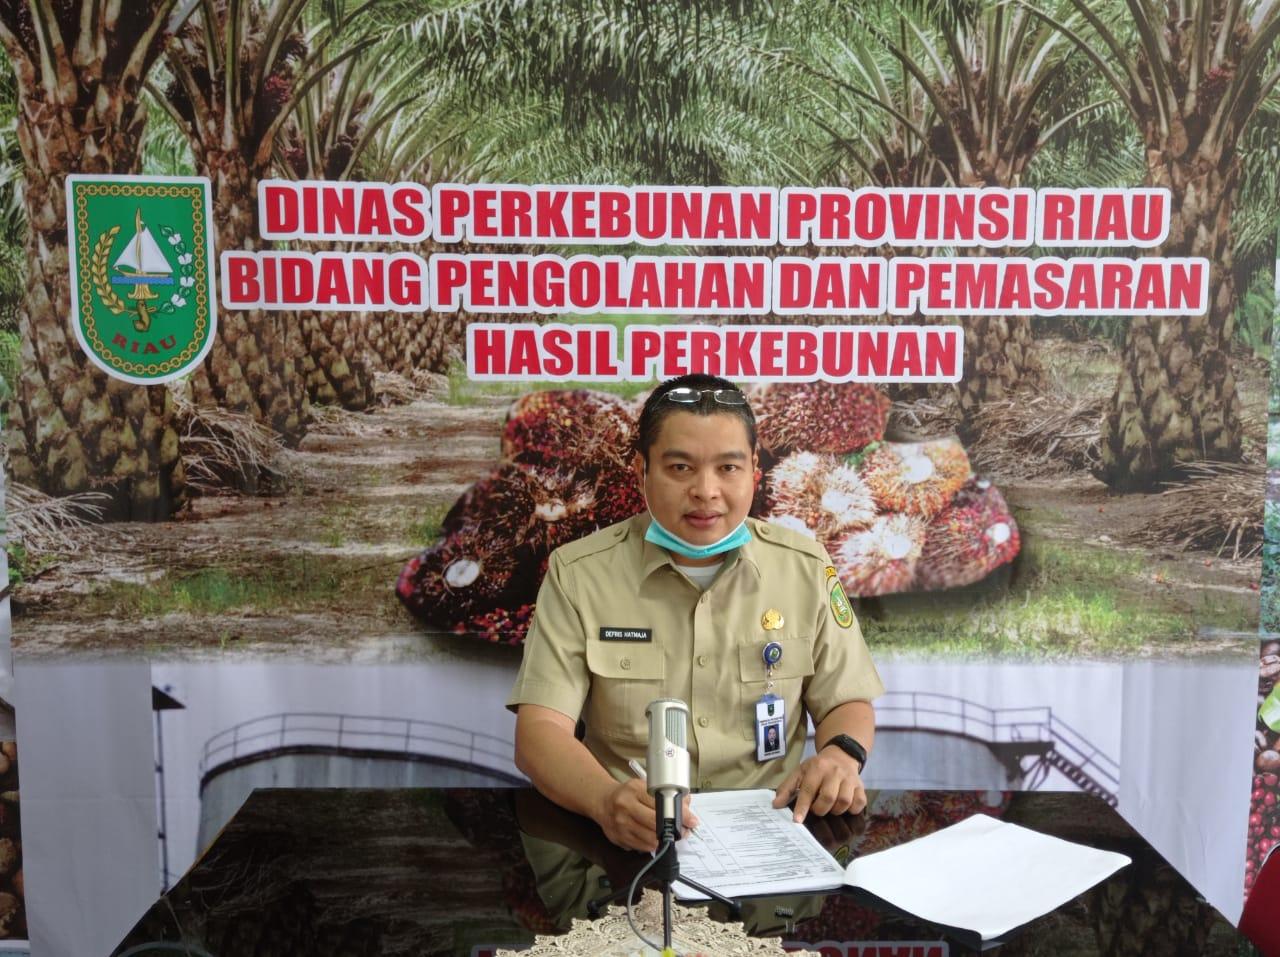 Harga TBS Kelapa Sawit Riau Masih Diatas Rp 2000 per Kg